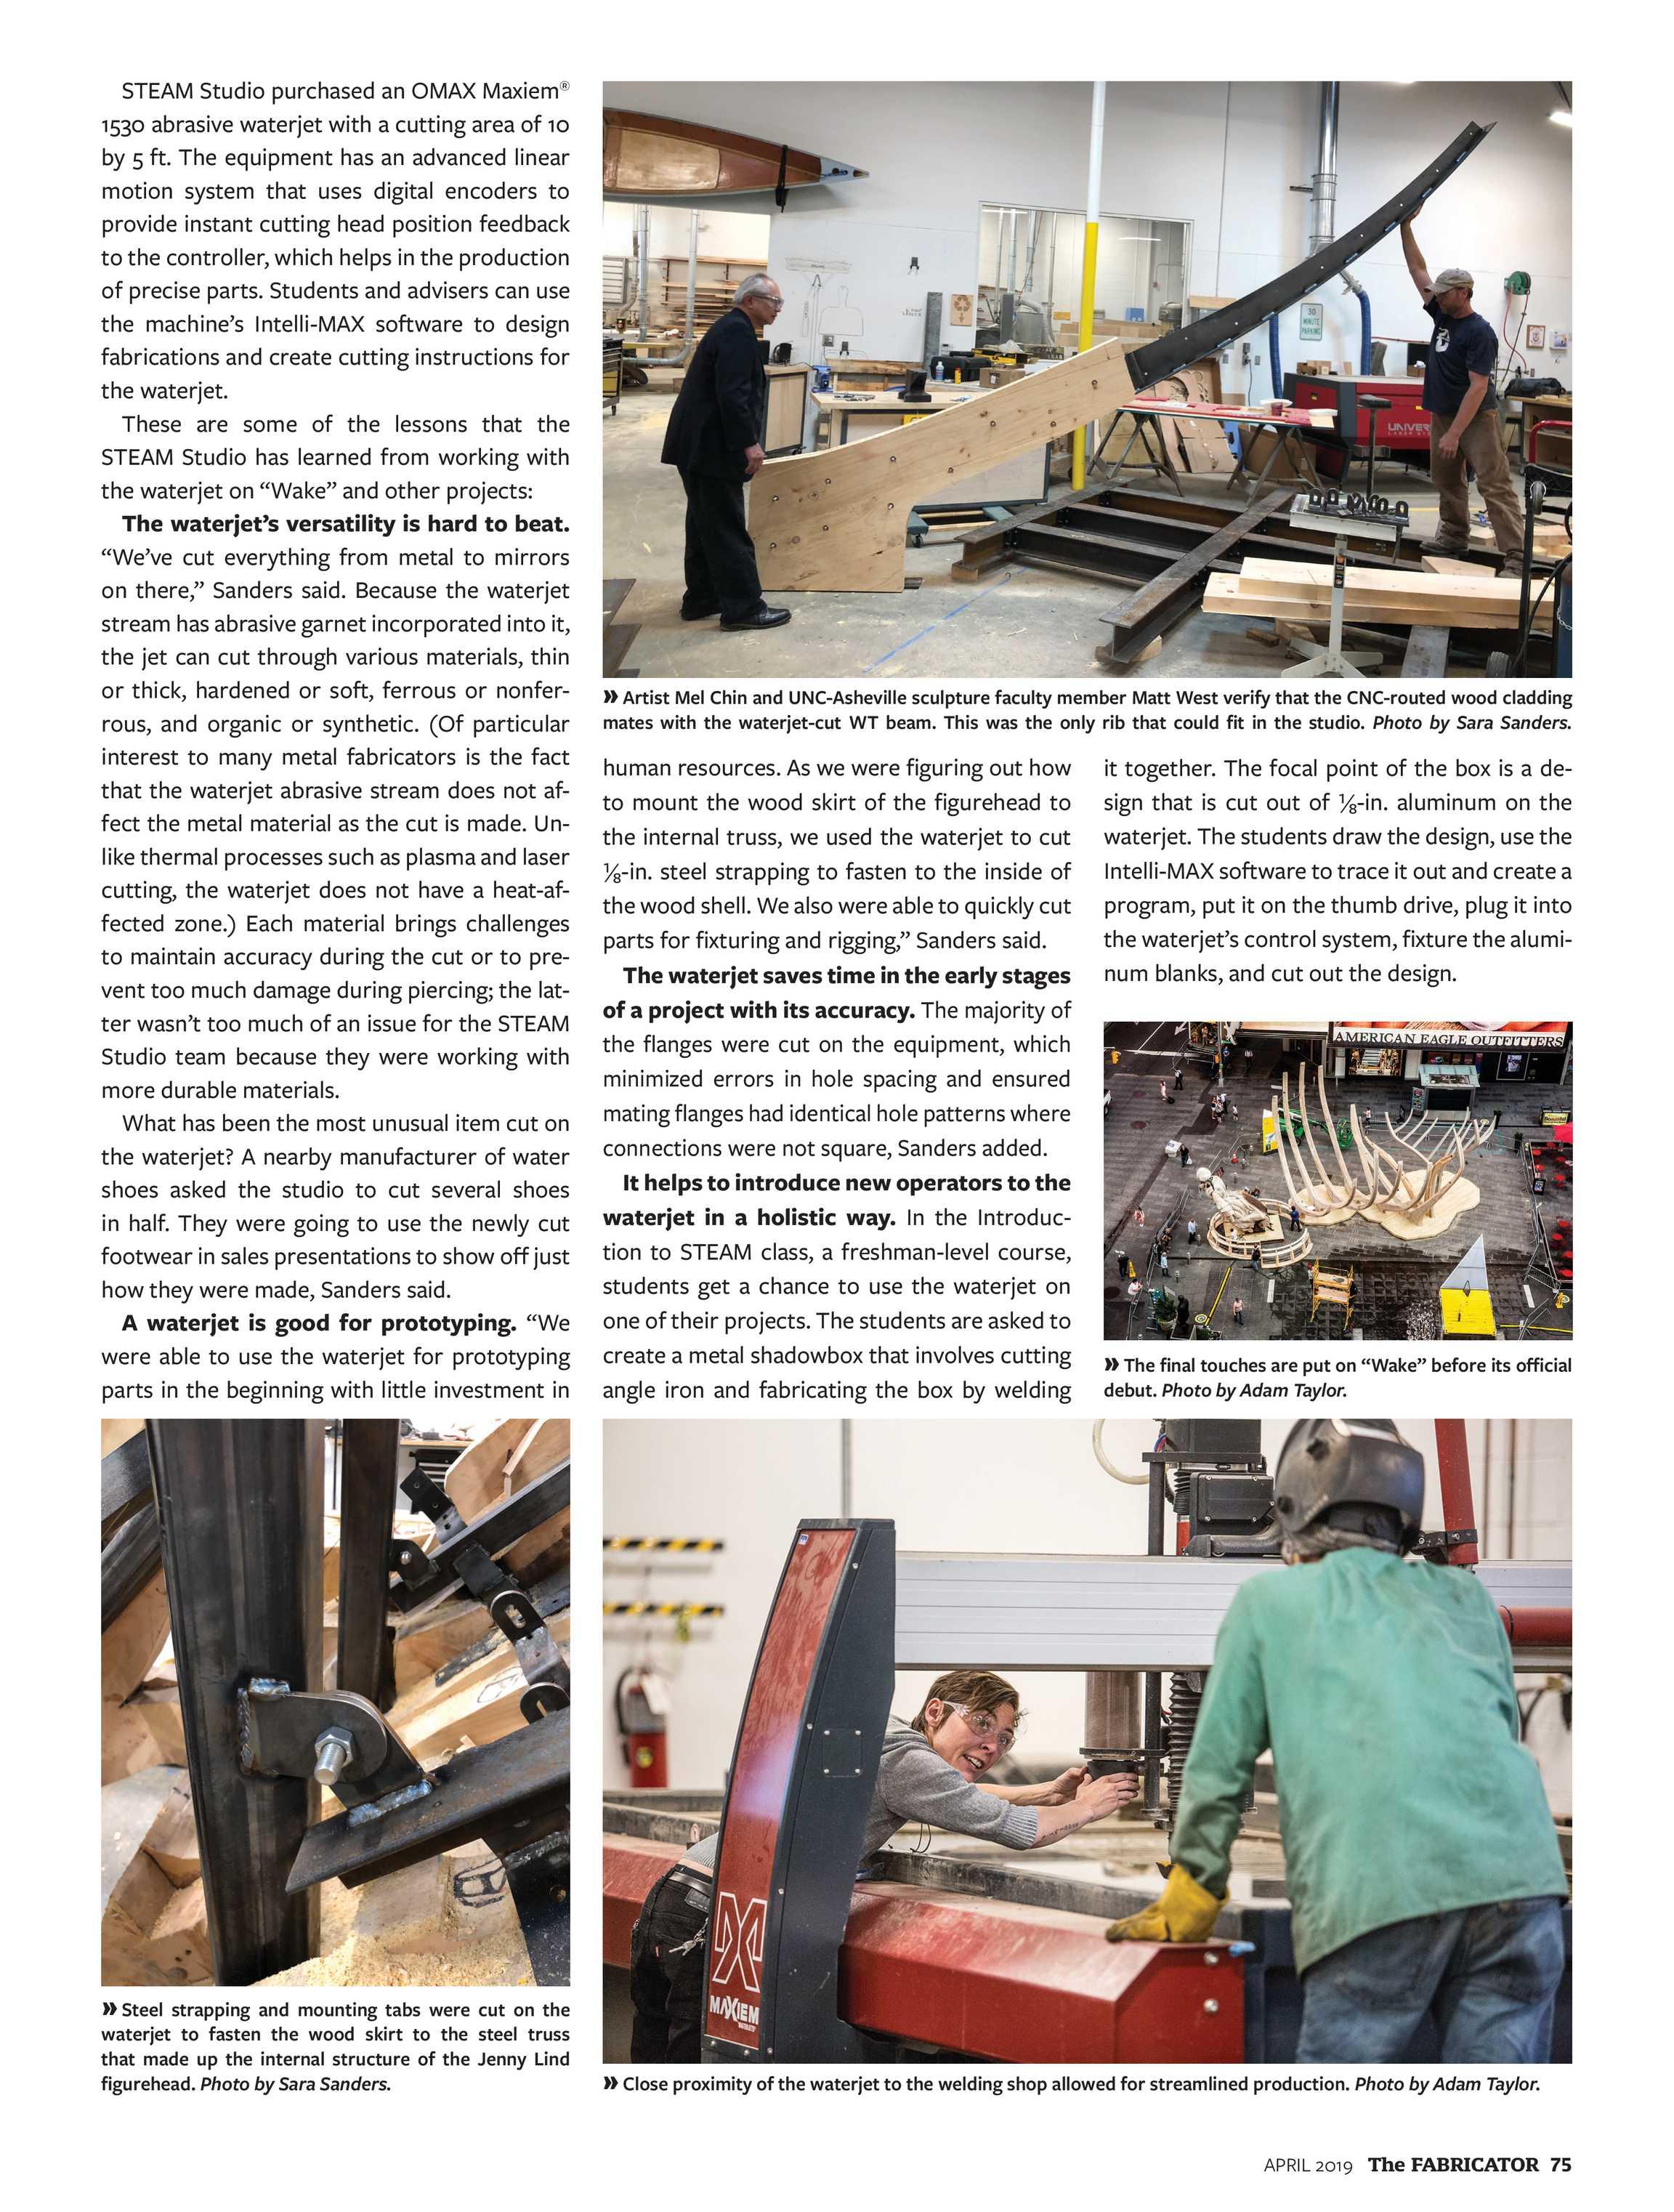 The Fabricator - April 2019 - page 74